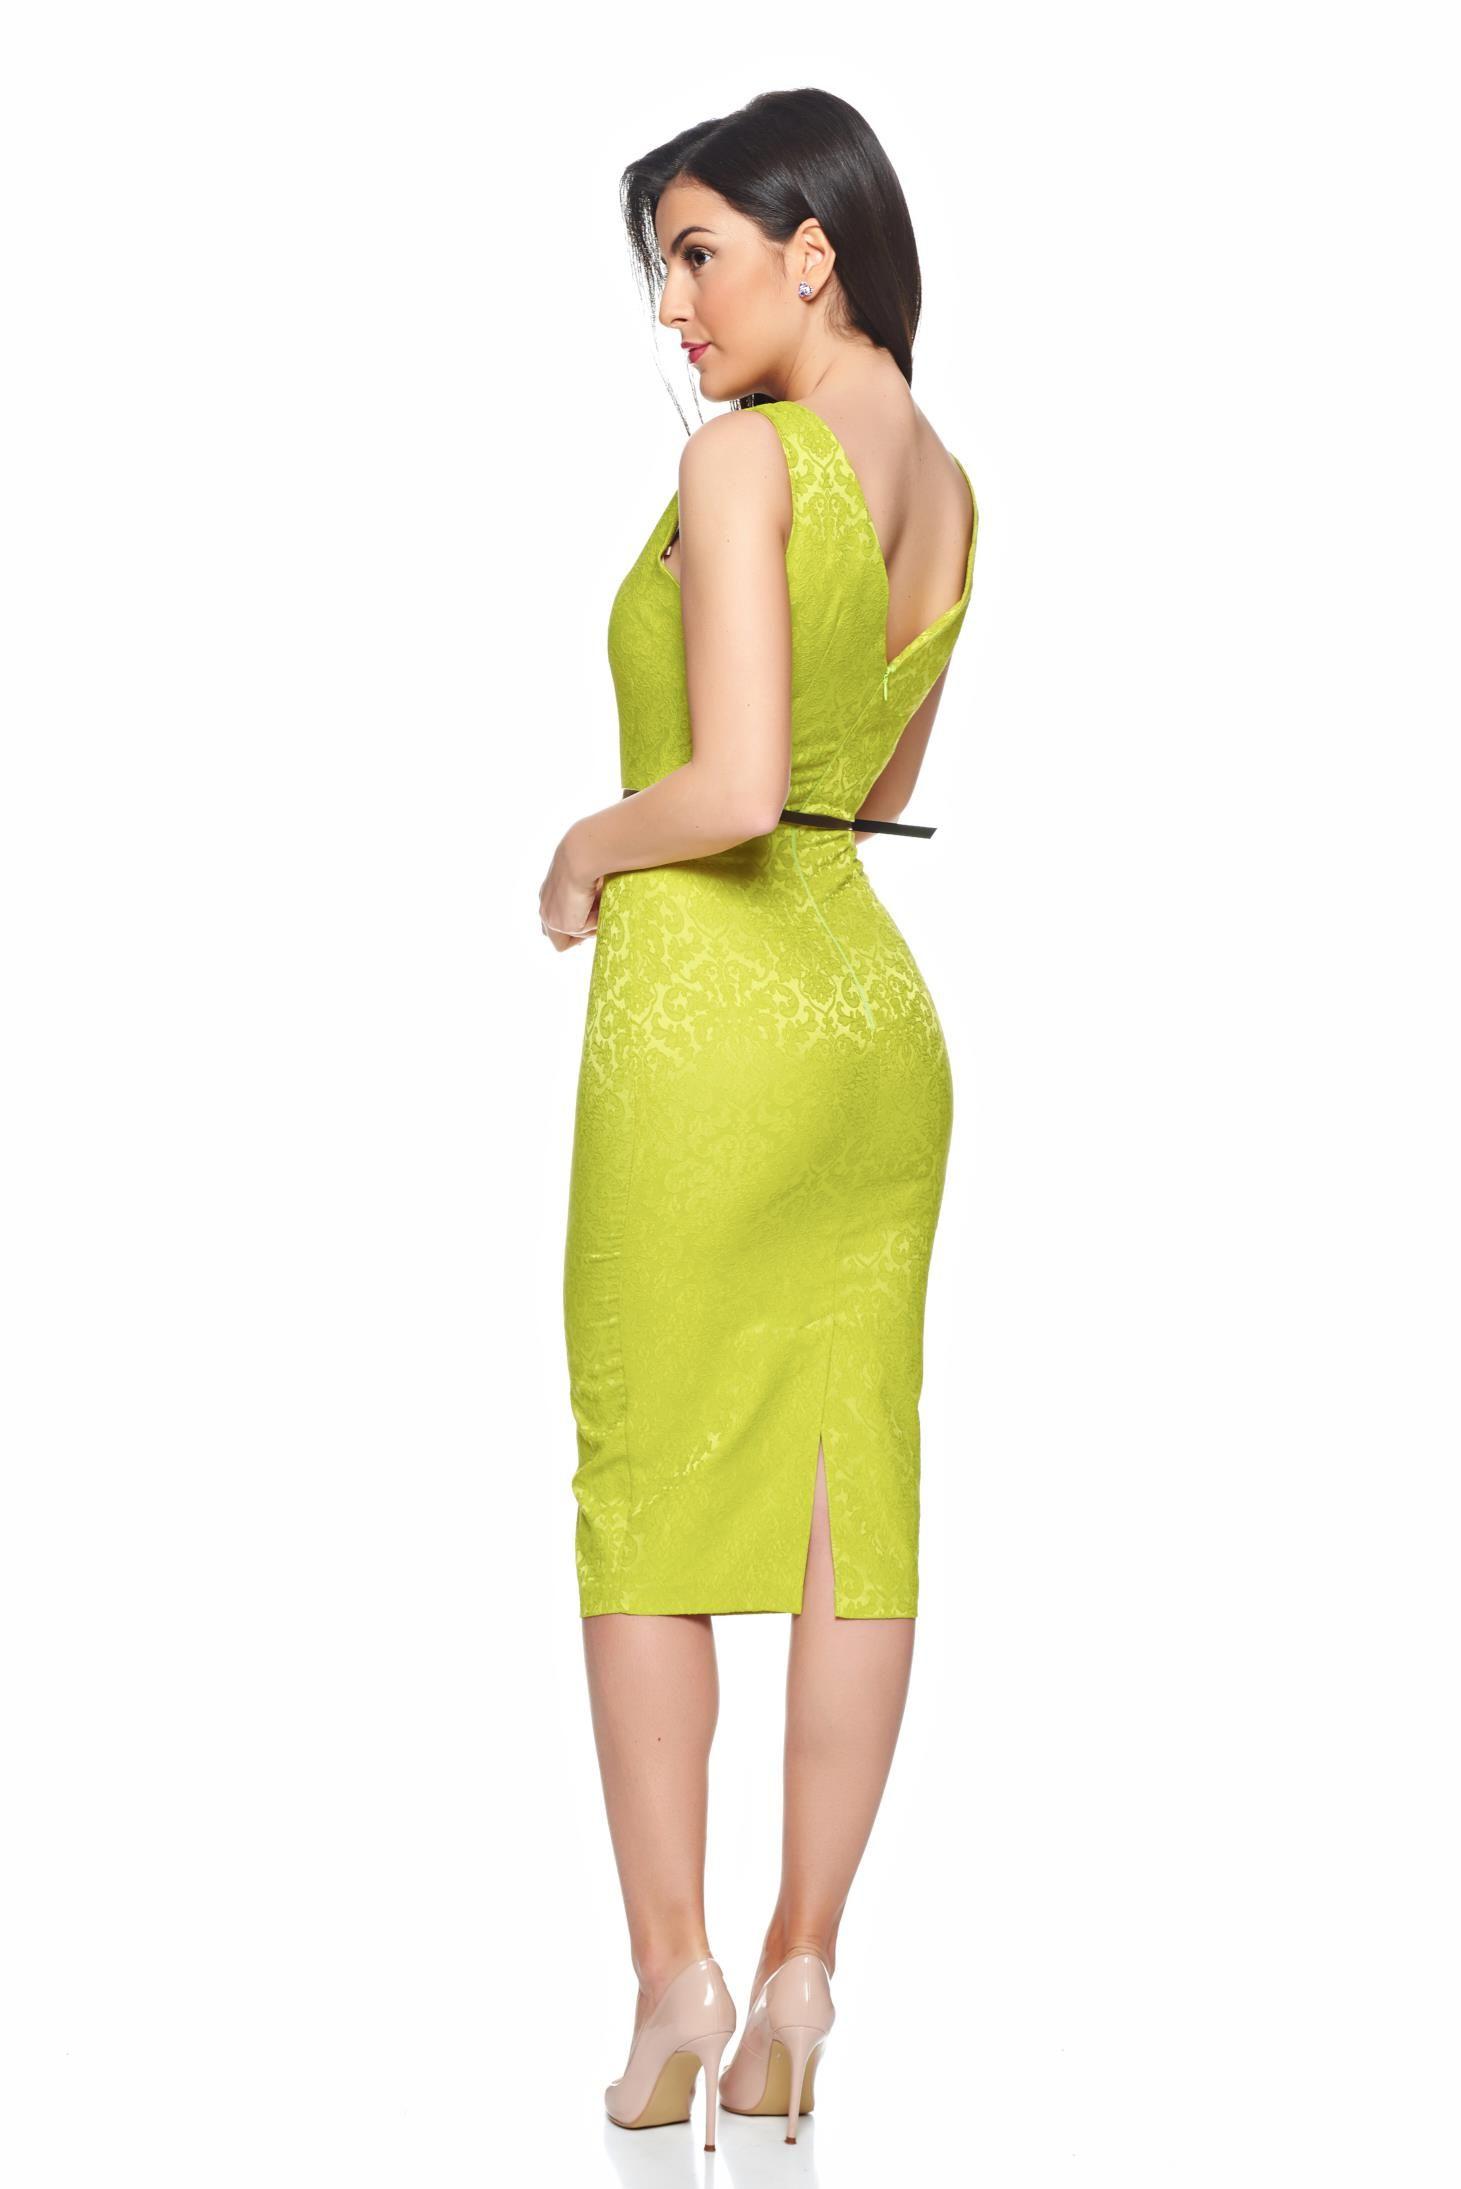 Starshiners Prettygirl Determination Lightgreen Dress S025806 3 In 2020 Dresses Bodycon Dress Fashion